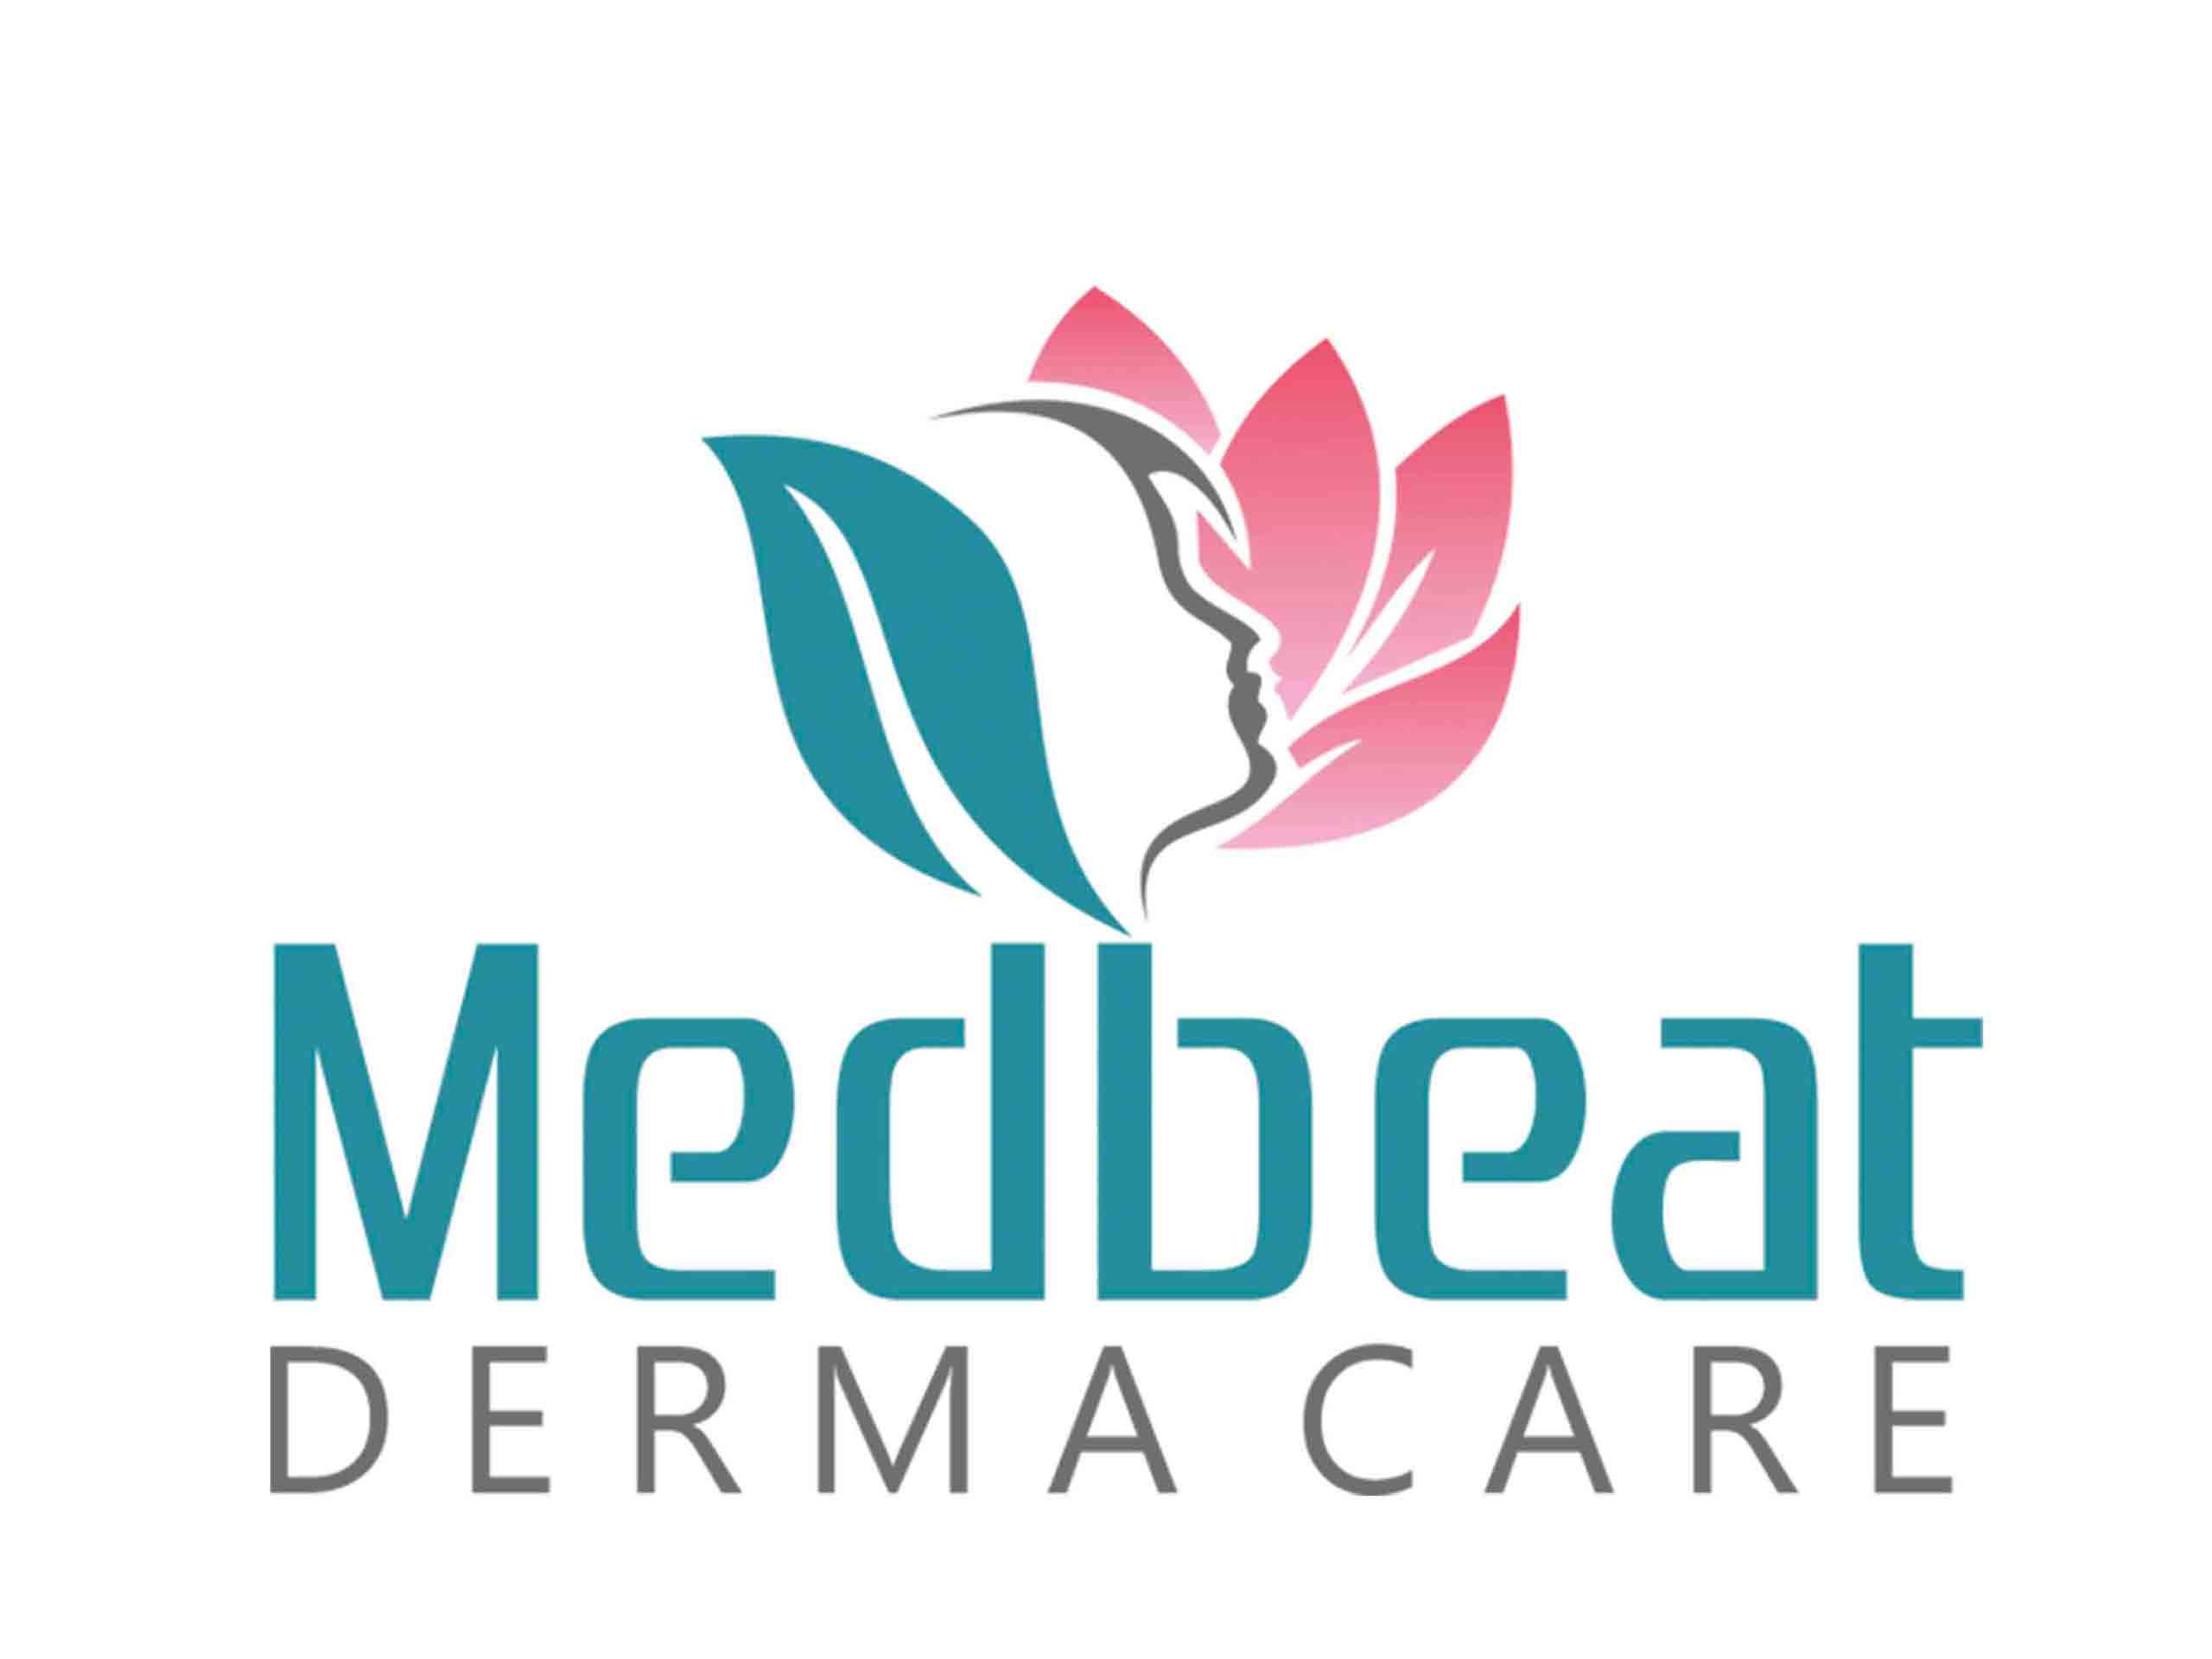 Medbeat Derma Care